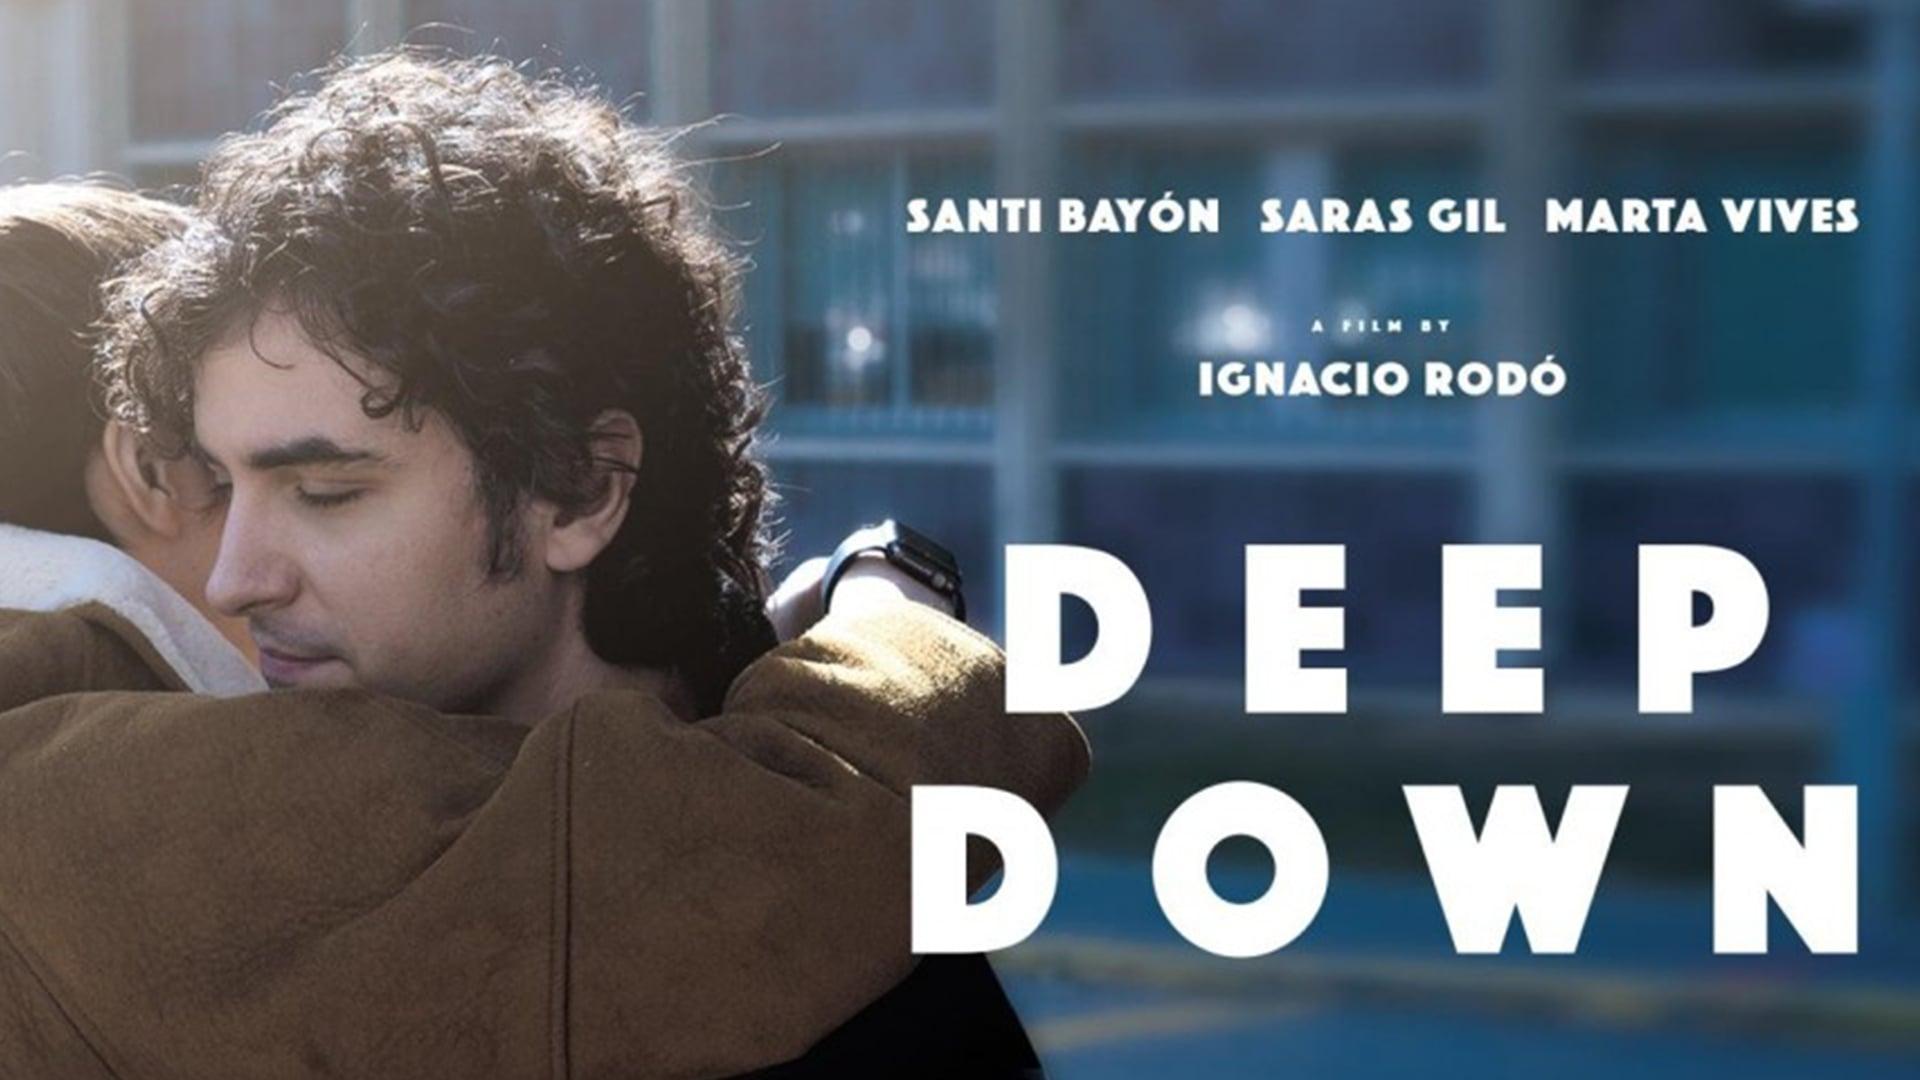 Deep down (short film trailer 2019)